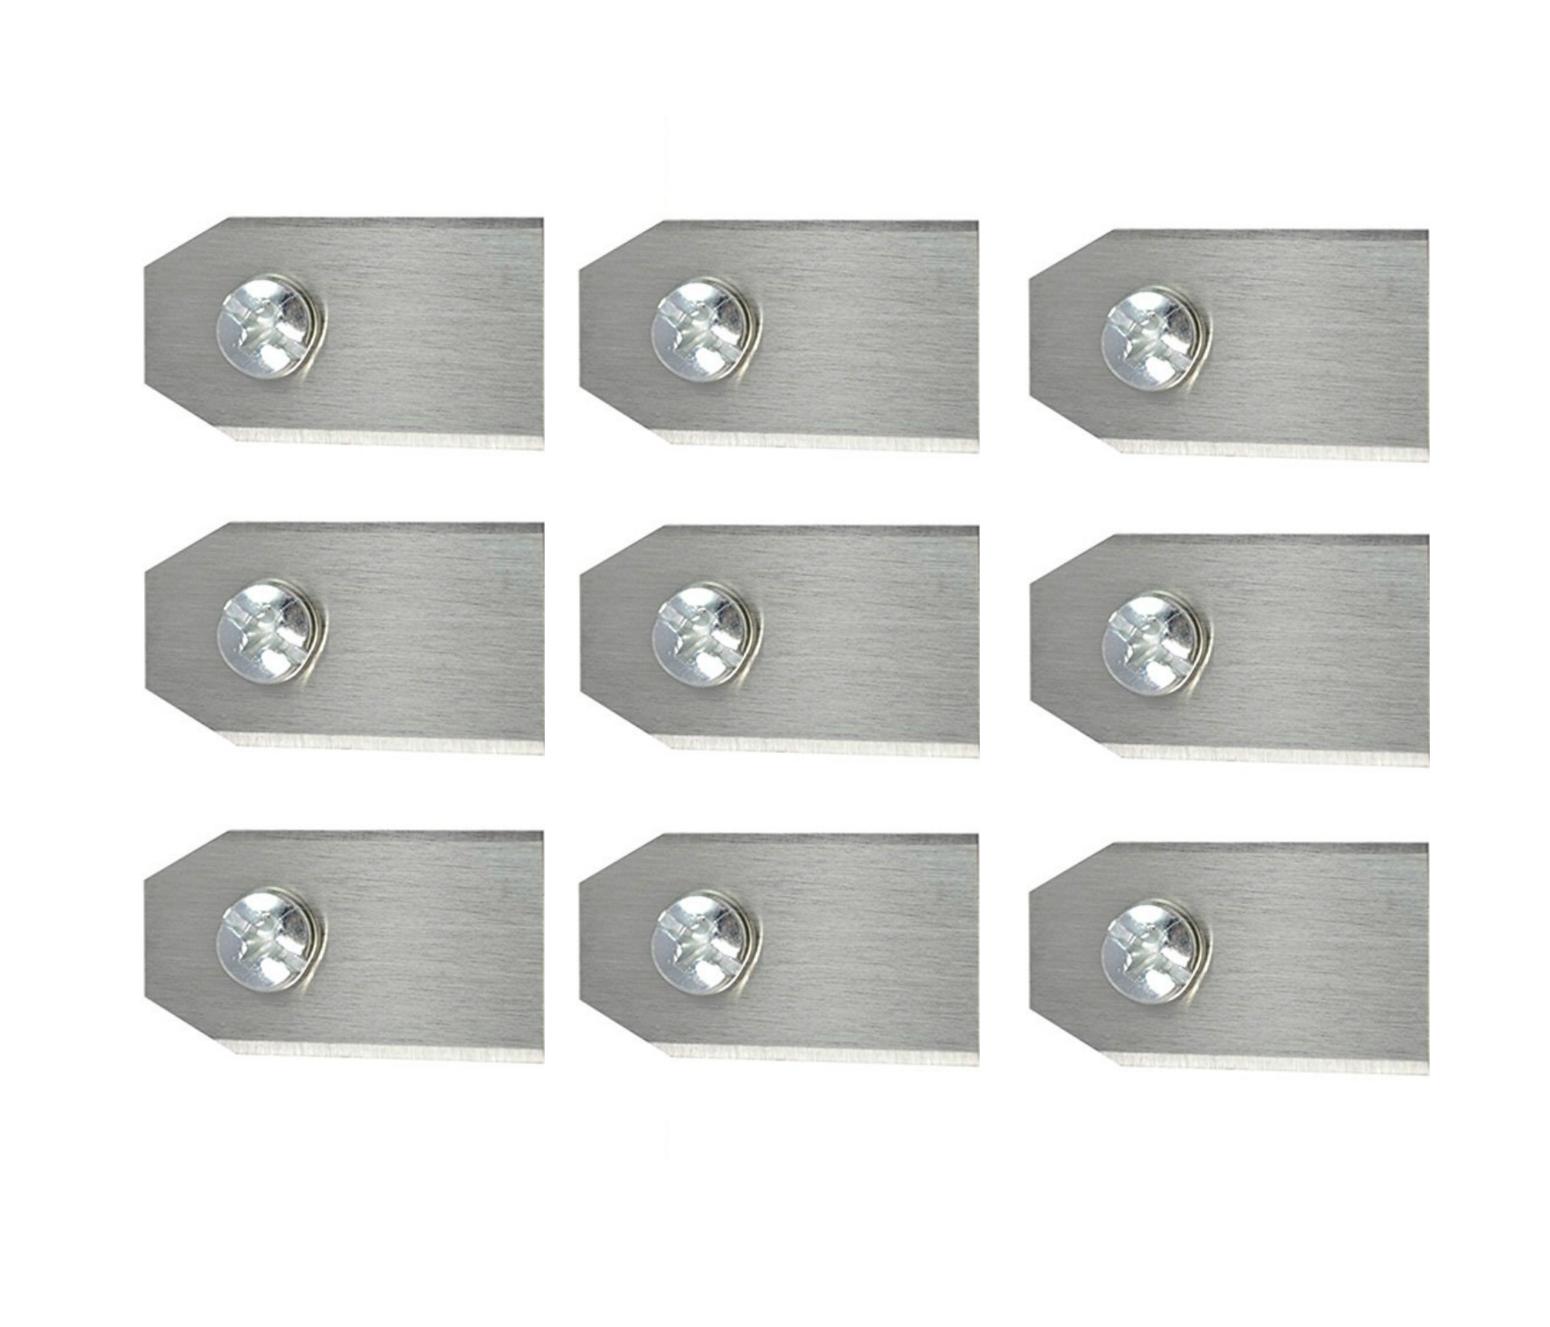 Messer Ersatzmesser 9er für Gardena Mähroboter R38Li R40Li R50Li R70Li Sileno